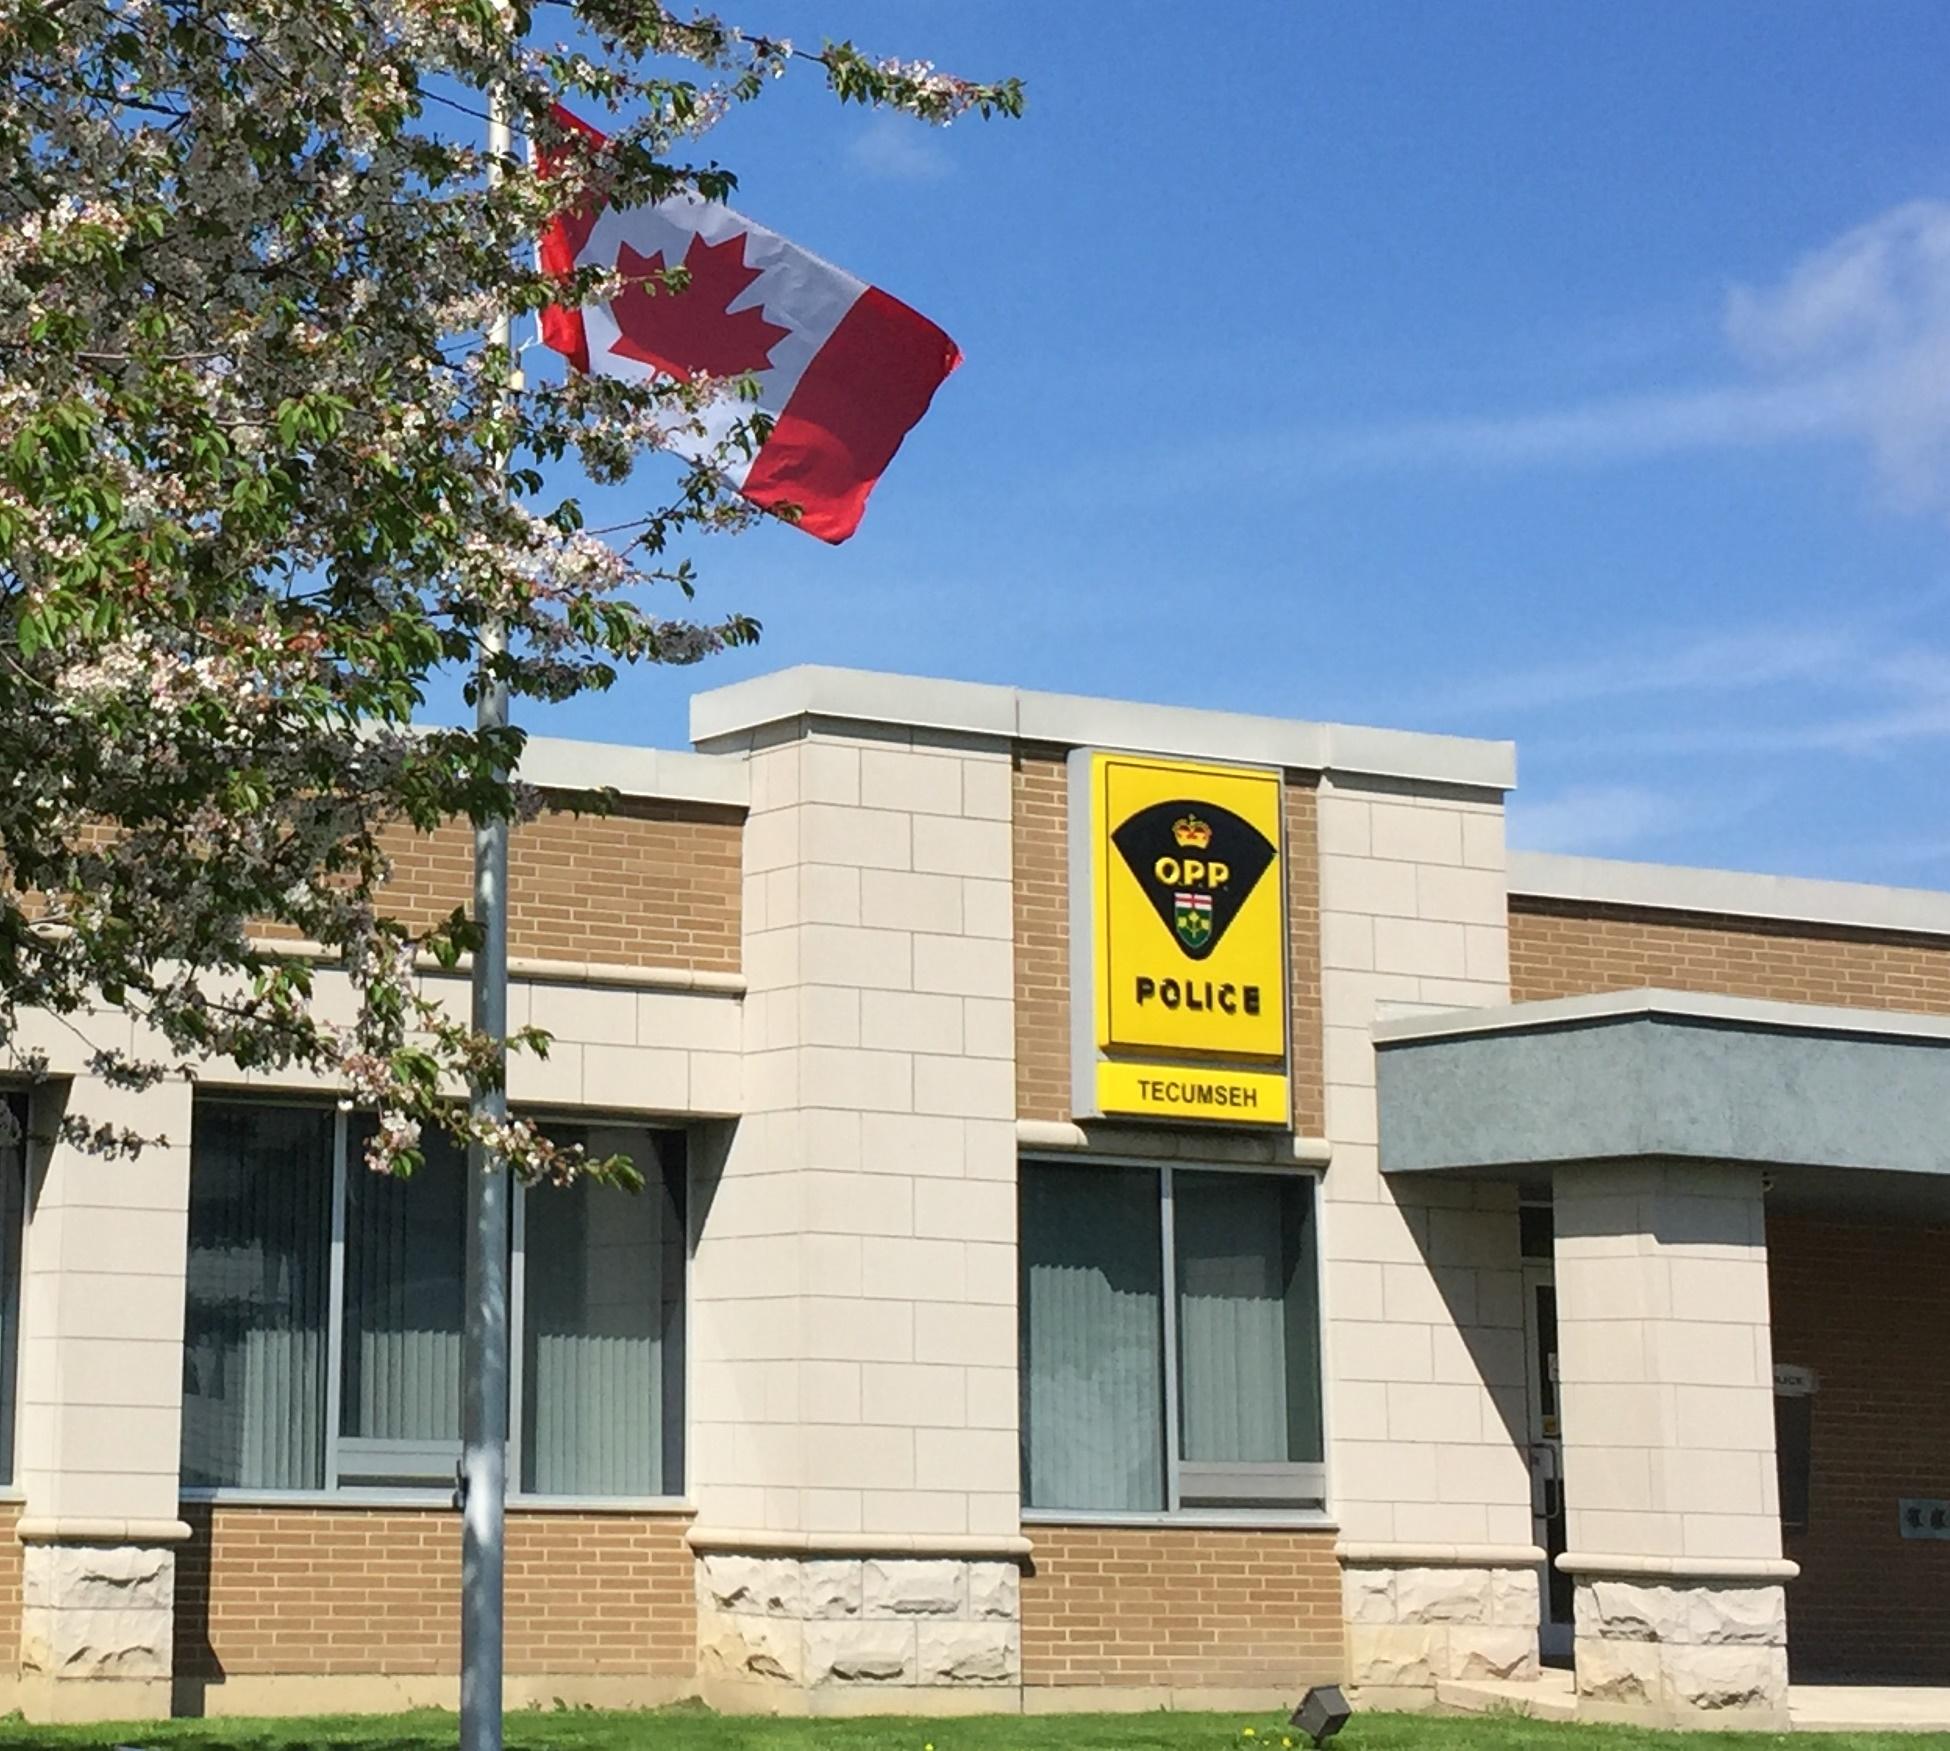 Image of Tecumseh OPP station